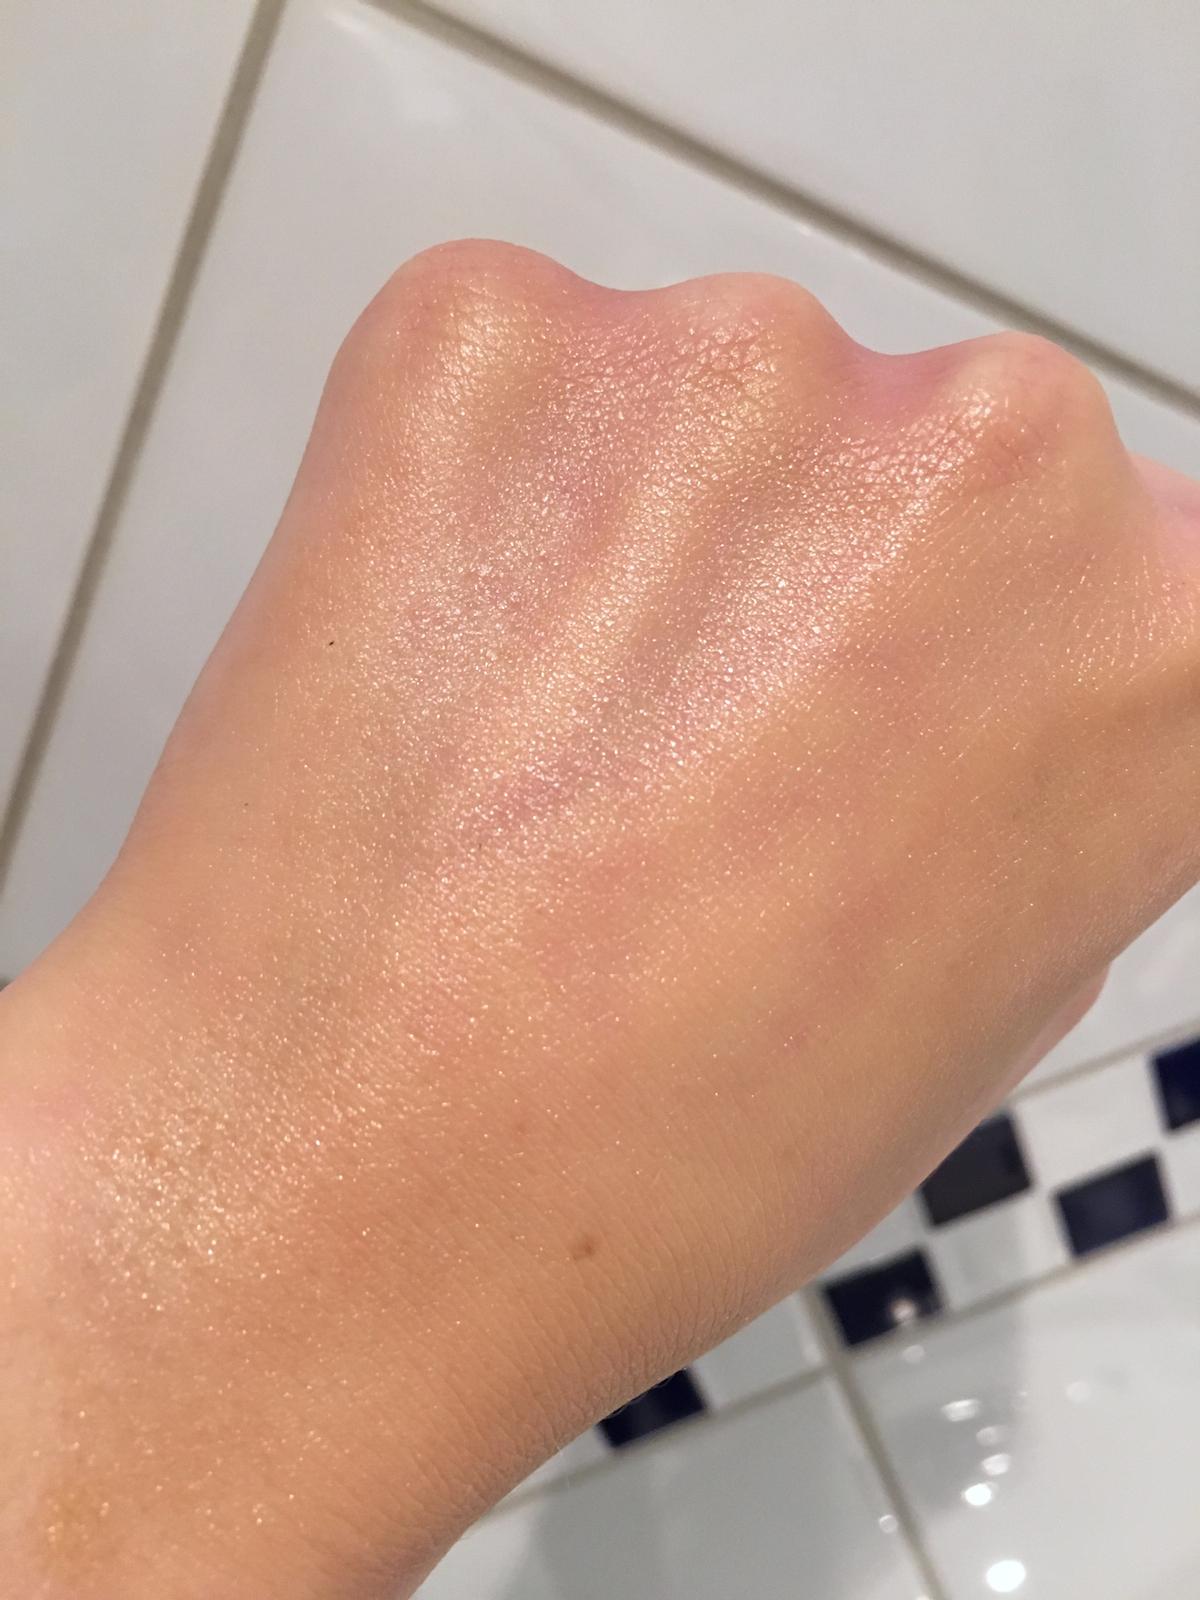 Natura Bisse the cure cream on hand|skonhetssnack.se